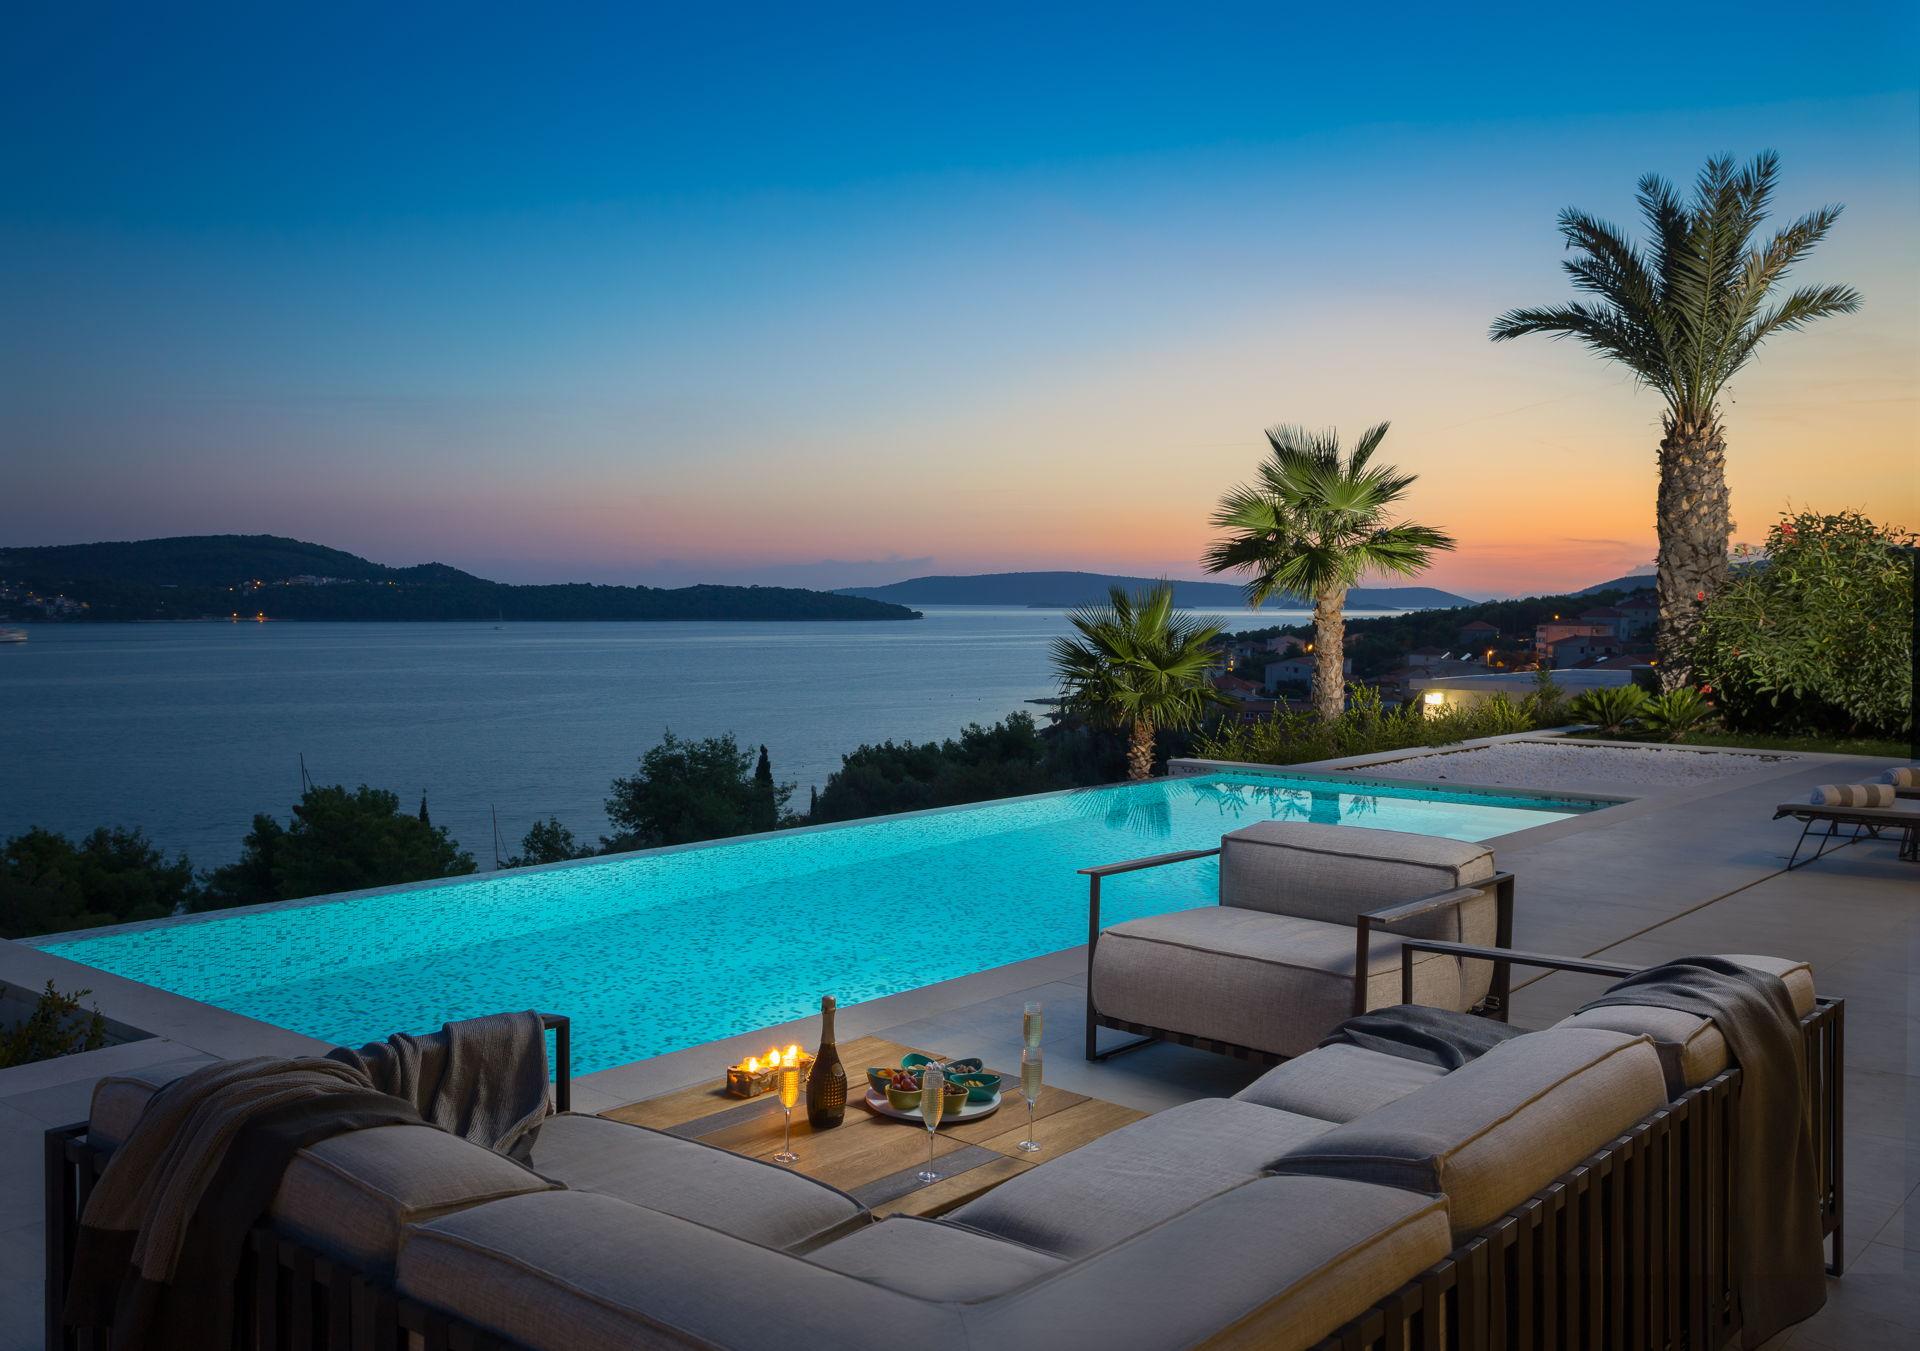 Infinity pool overlooking the sea and islands Ultraluxury Villa Elyzeum near Trogir in Croatia